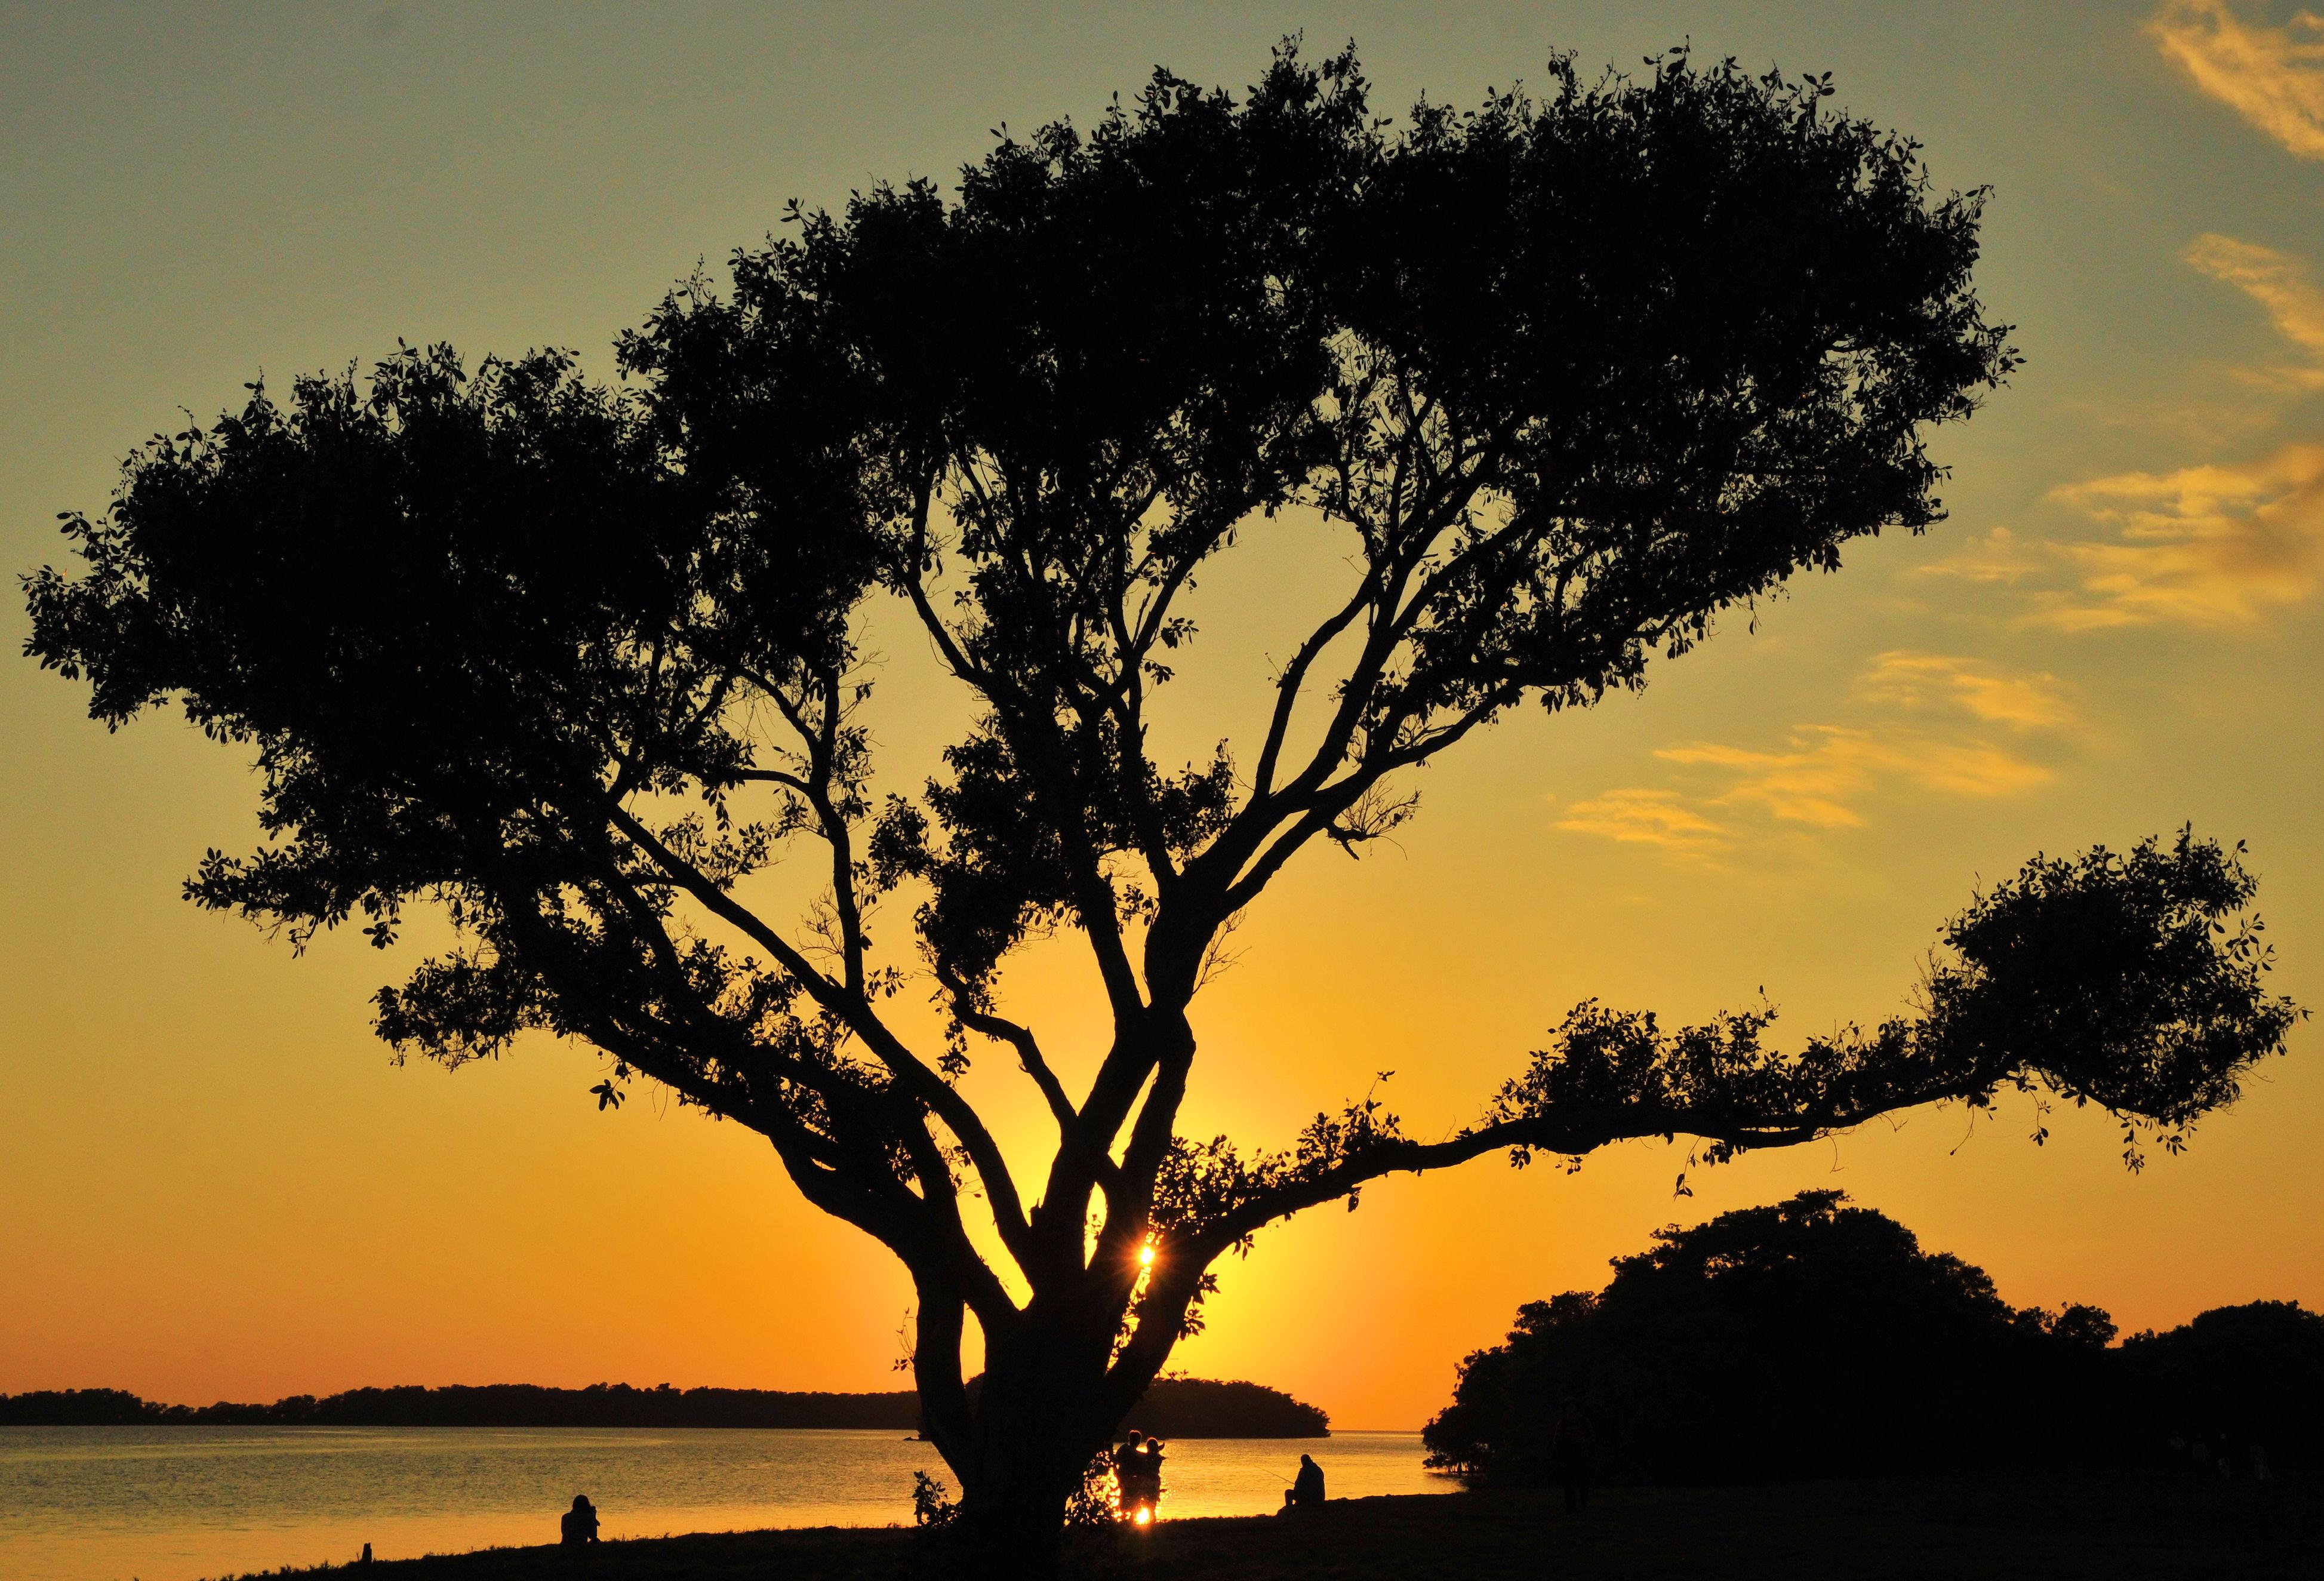 Sunset Shade, Everglades, Flamingo, Florida, Ocean, HQ Photo